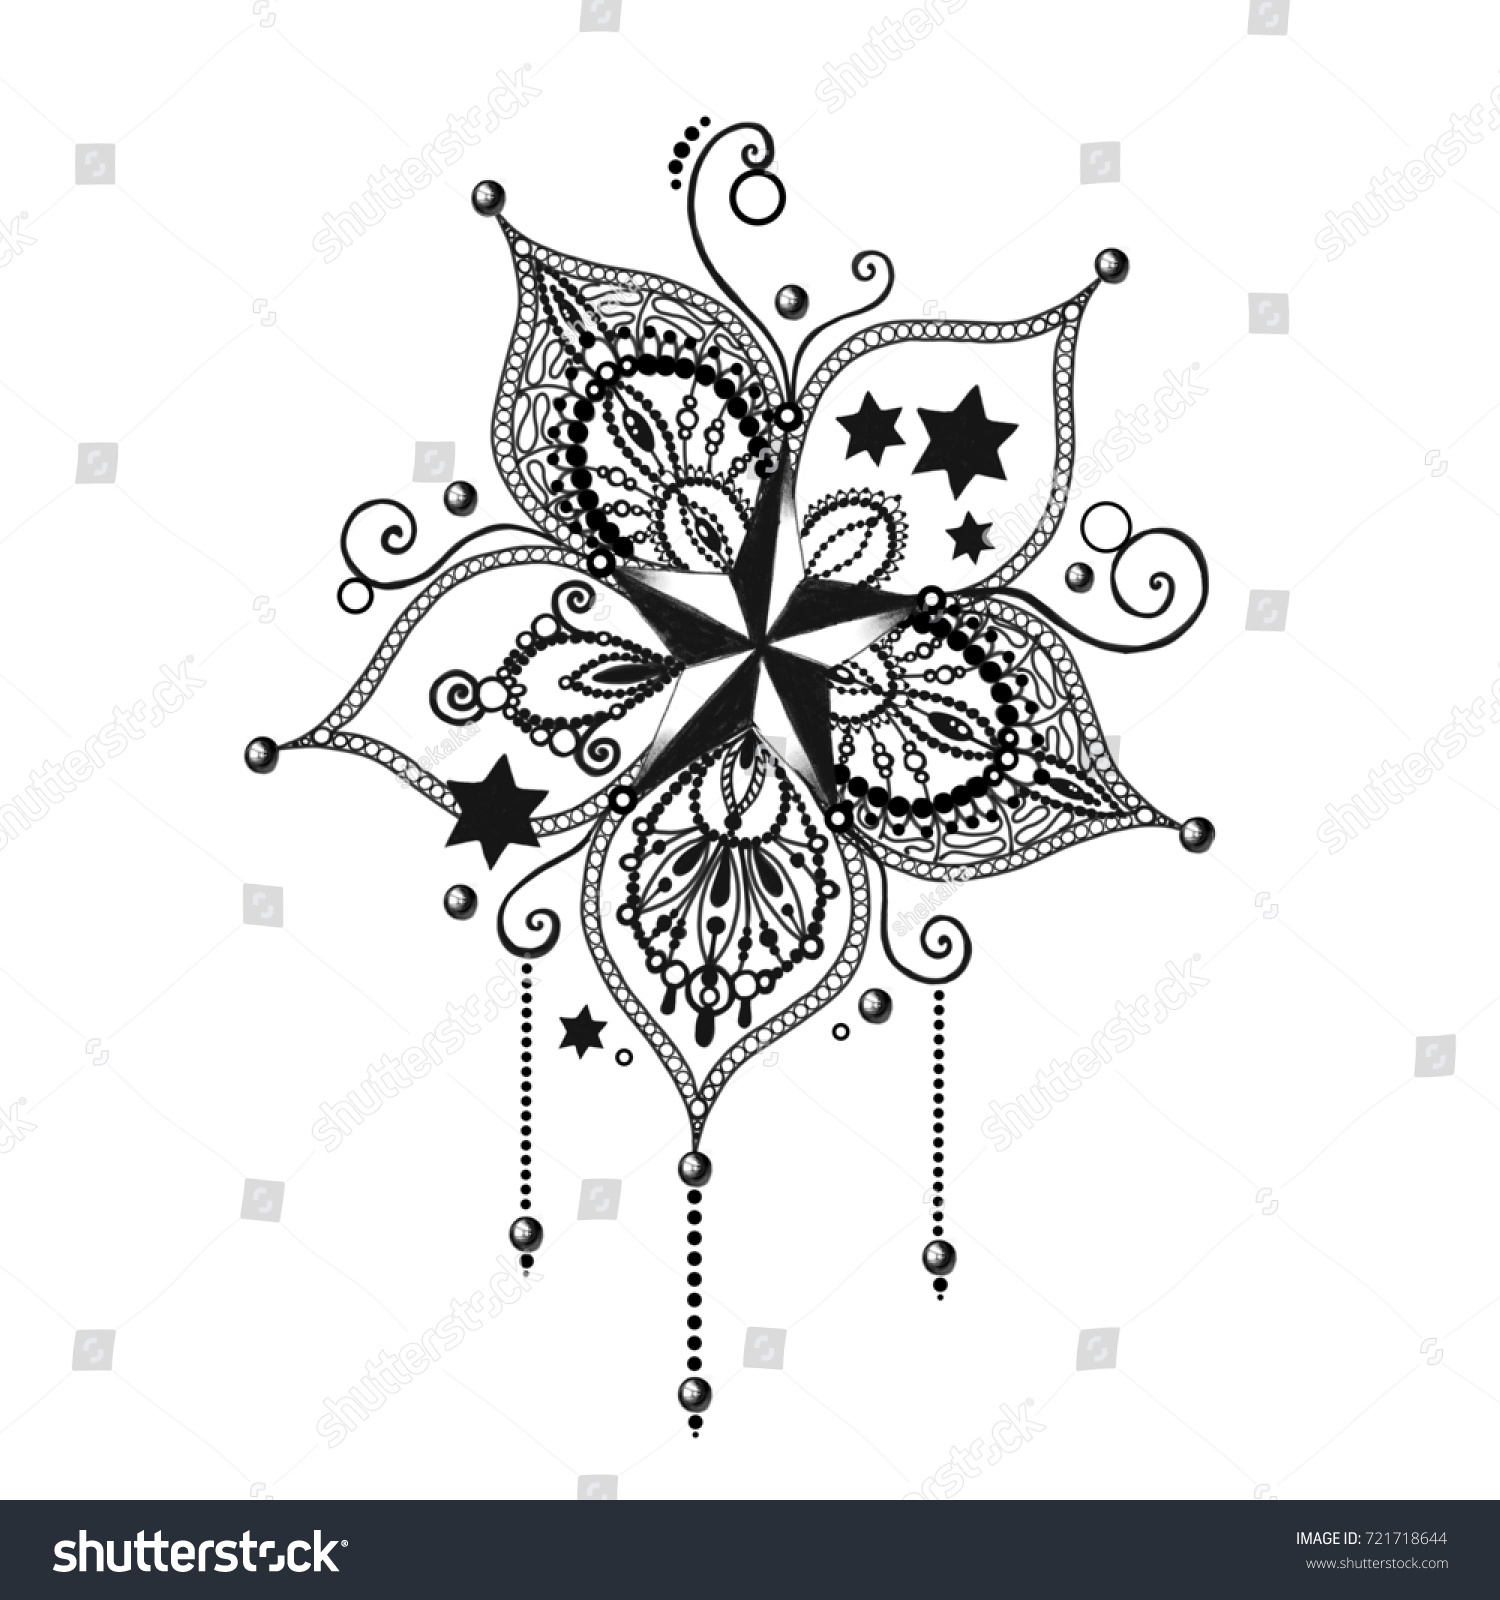 Mandala tattoo hand drawn lotus flower stock illustration 721718644 mandala tattoo hand drawn lotus flower sacred symbol izmirmasajfo